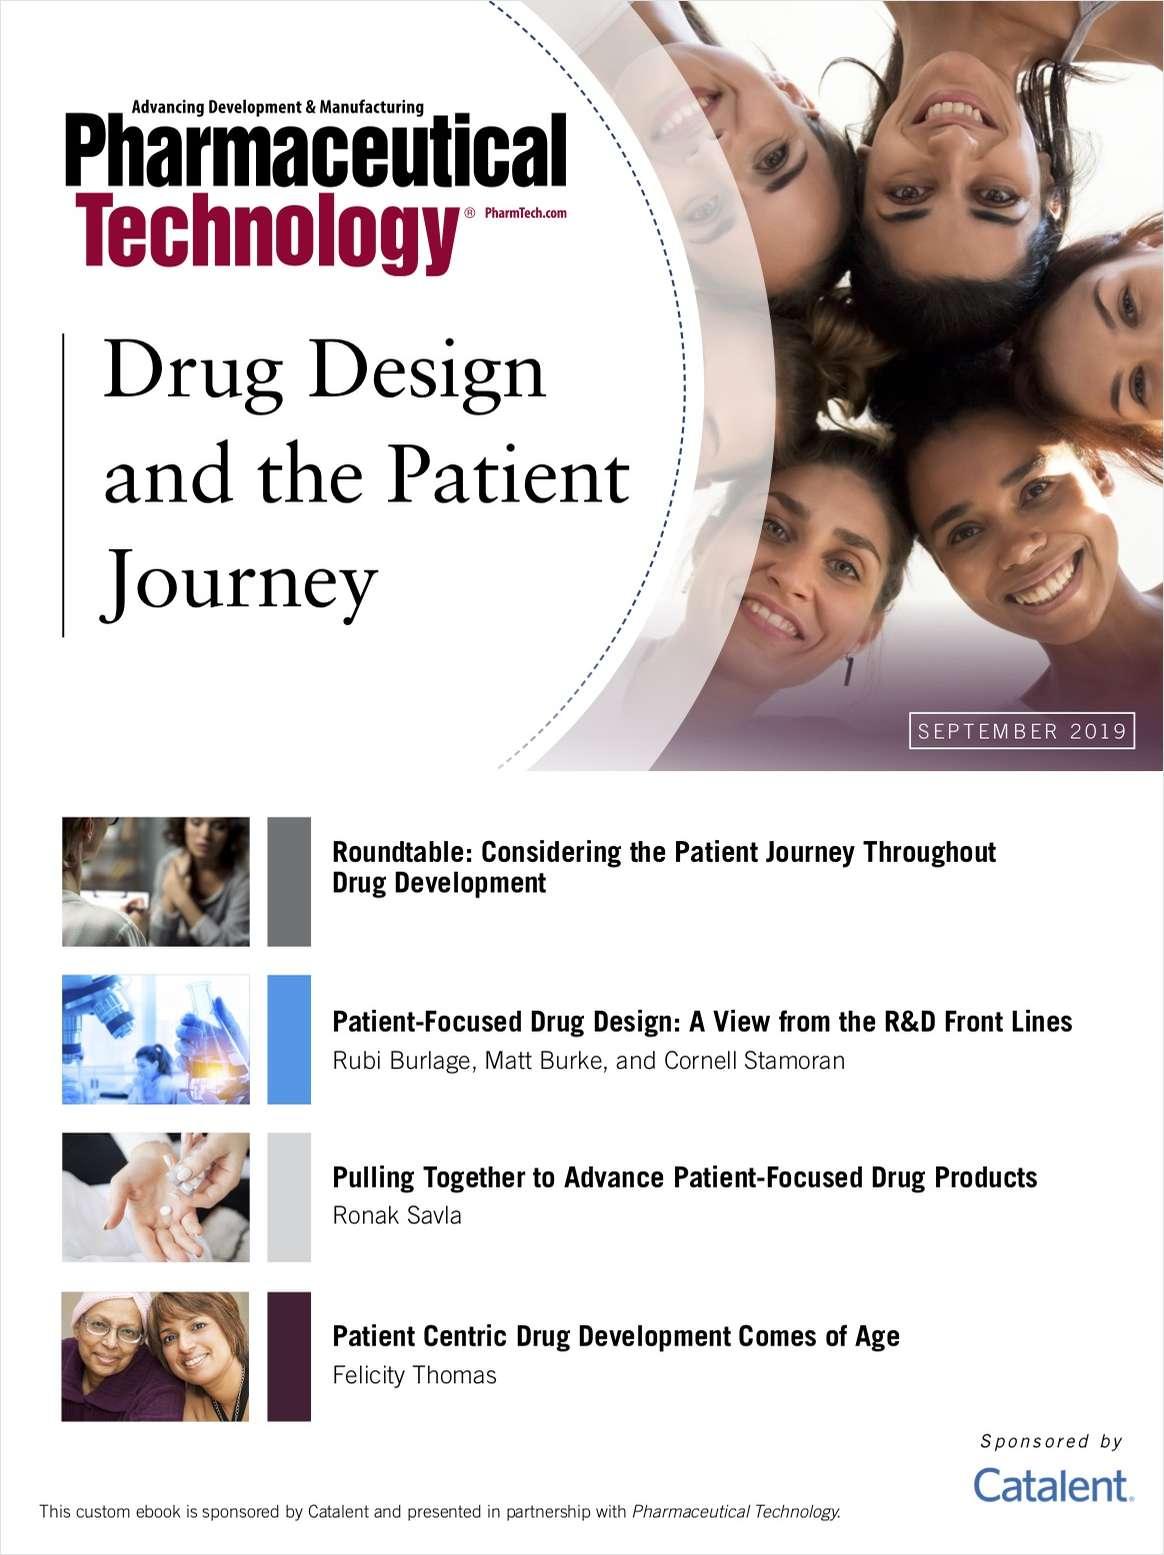 Drug Design and the Patient Journey